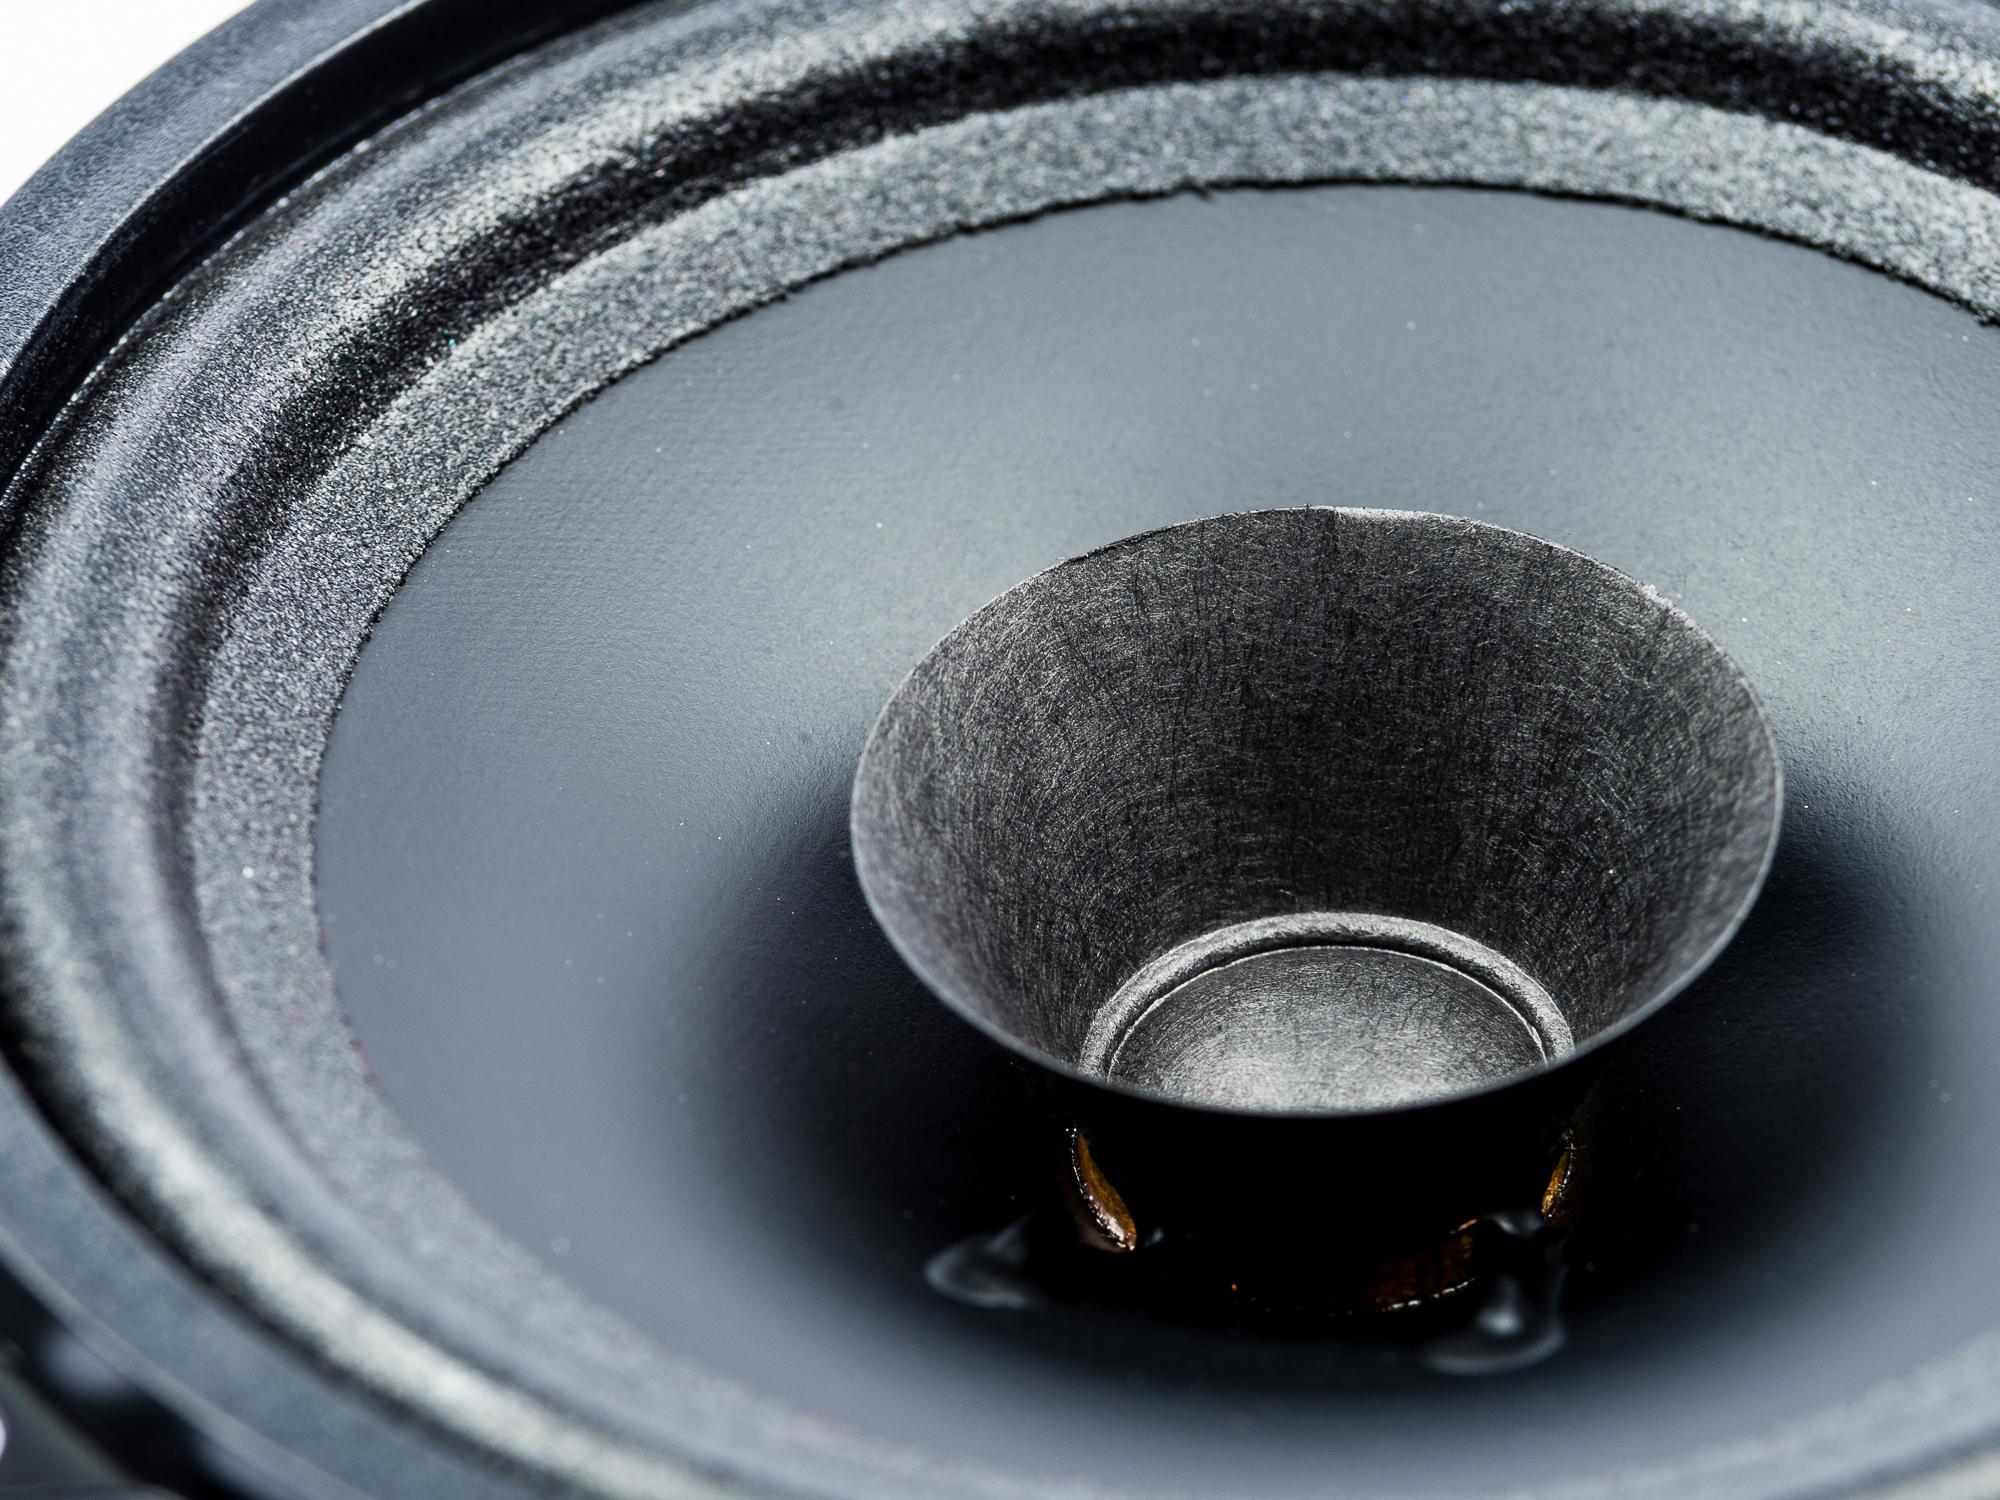 1 Paar PG Audio EVO I 13.2, 13 cm Dual Cone Lautsprecher passend für Chrysler,Citroen,Dacia,Ford,Opel,Peugeot & Renault – Bild 5